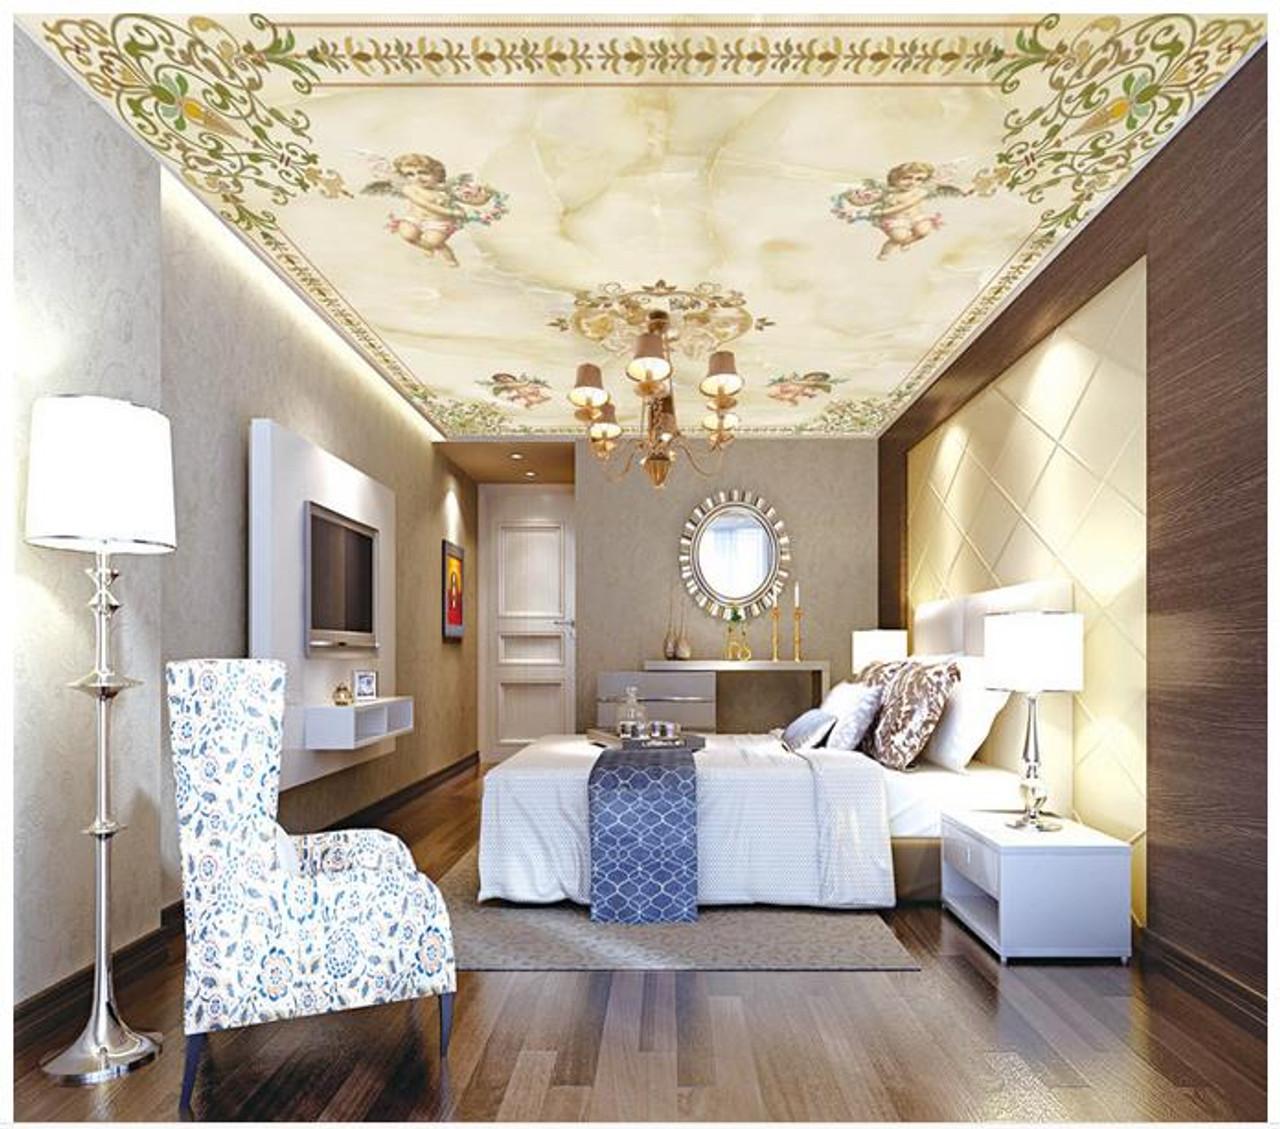 Custom 3d wallpaper 3d ceiling murals wallpaper European angel frescoes on the ceiling suspended ceiling bedroom  32068.1567751241